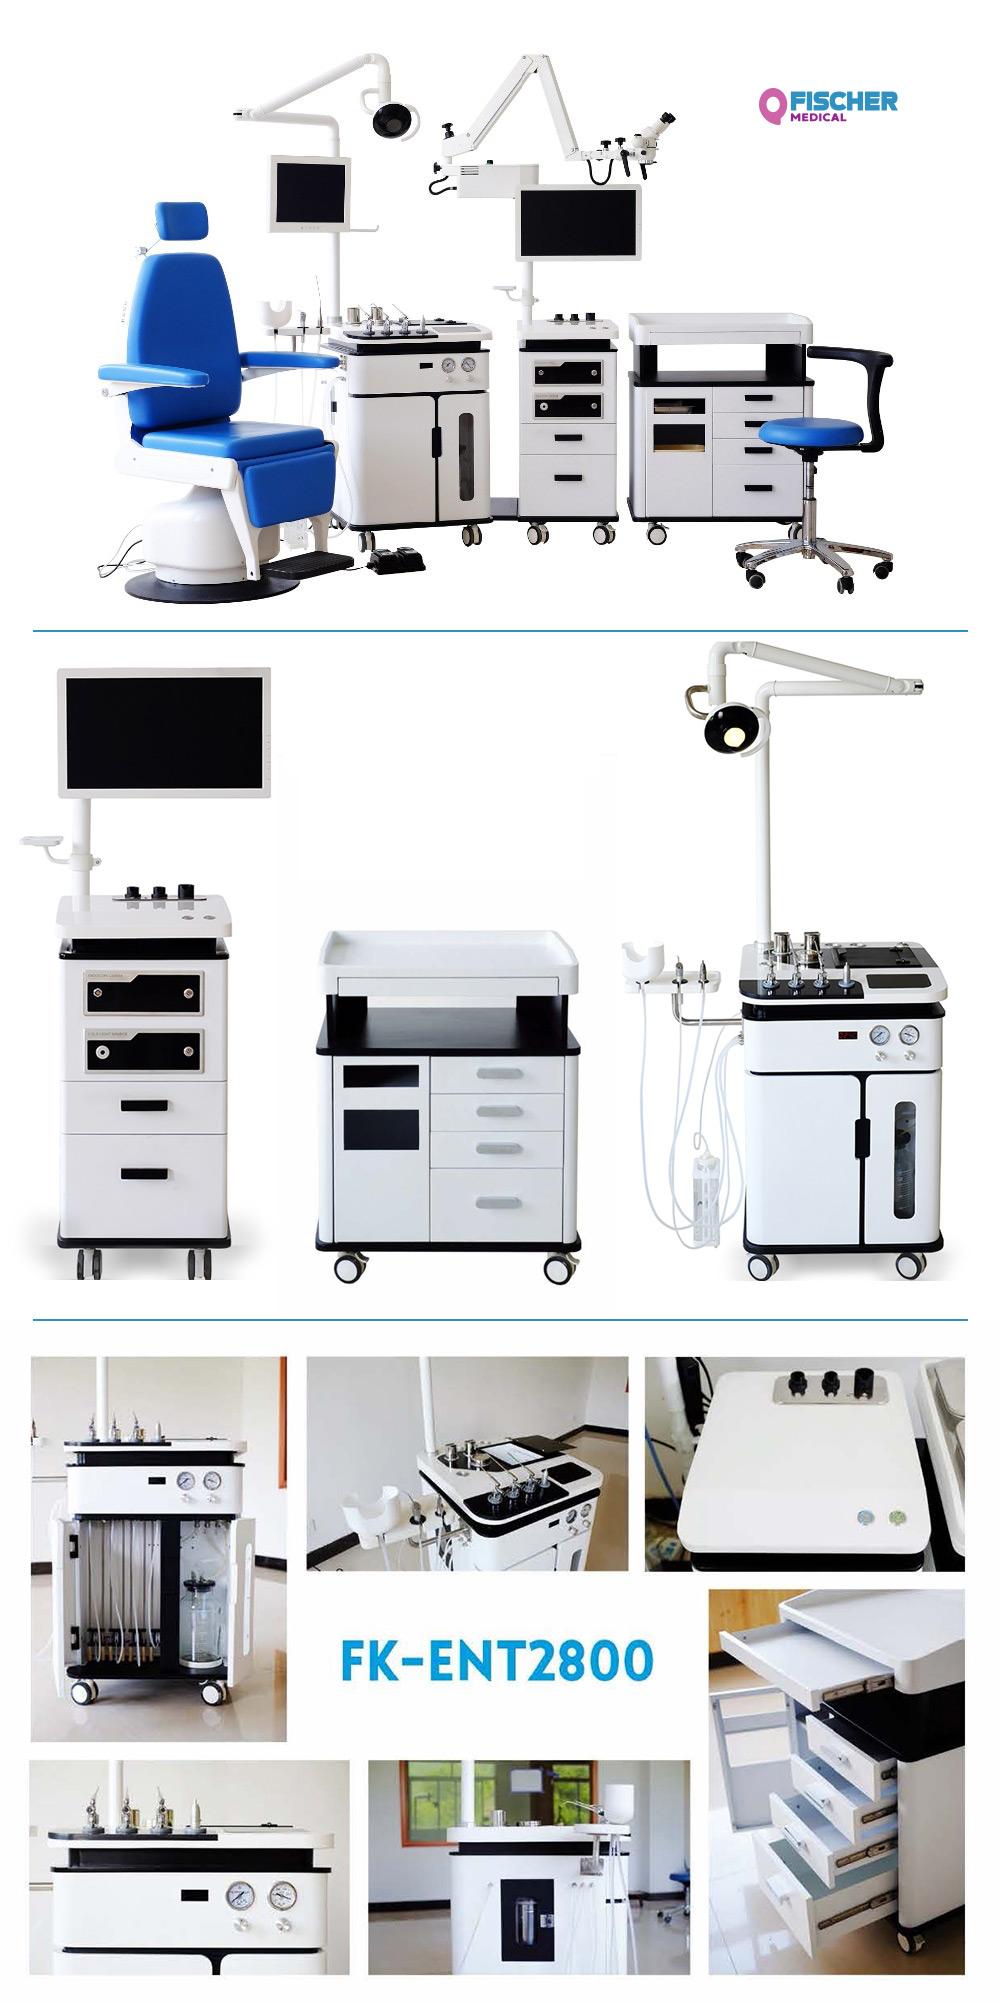 unit-laryngologiczny-2800